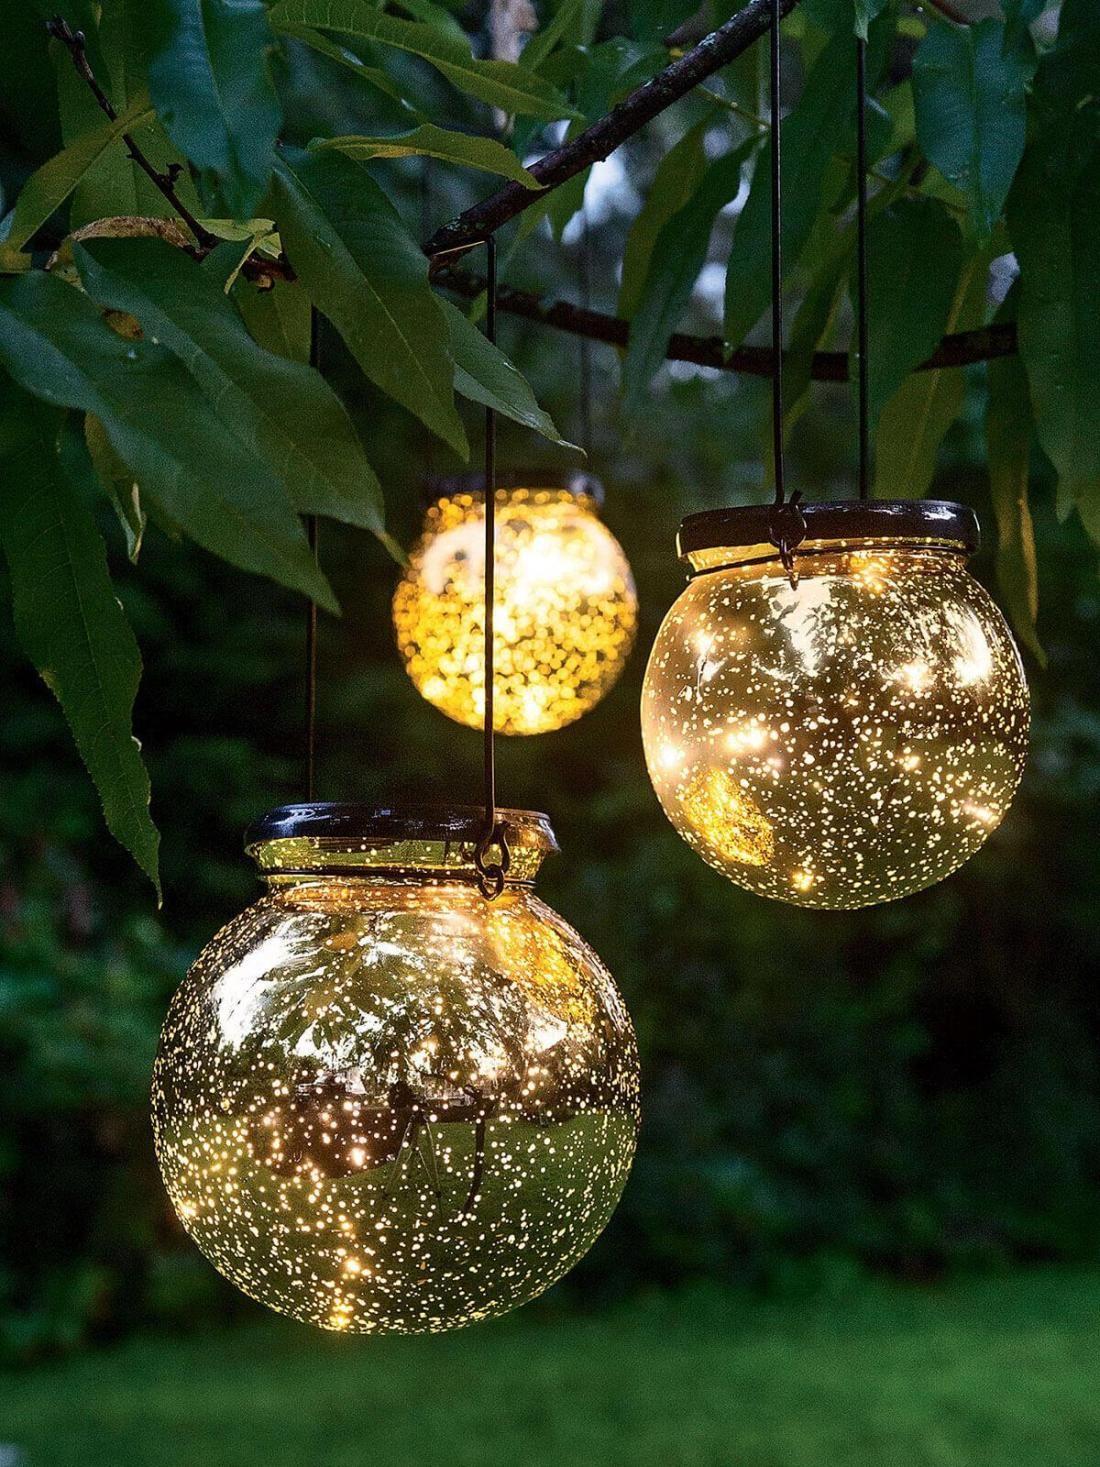 25 Awesome Backyard Lighting Ideas For Your Home 2020 Solar Lights Garden Backyard Lighting Landscape Lighting Design